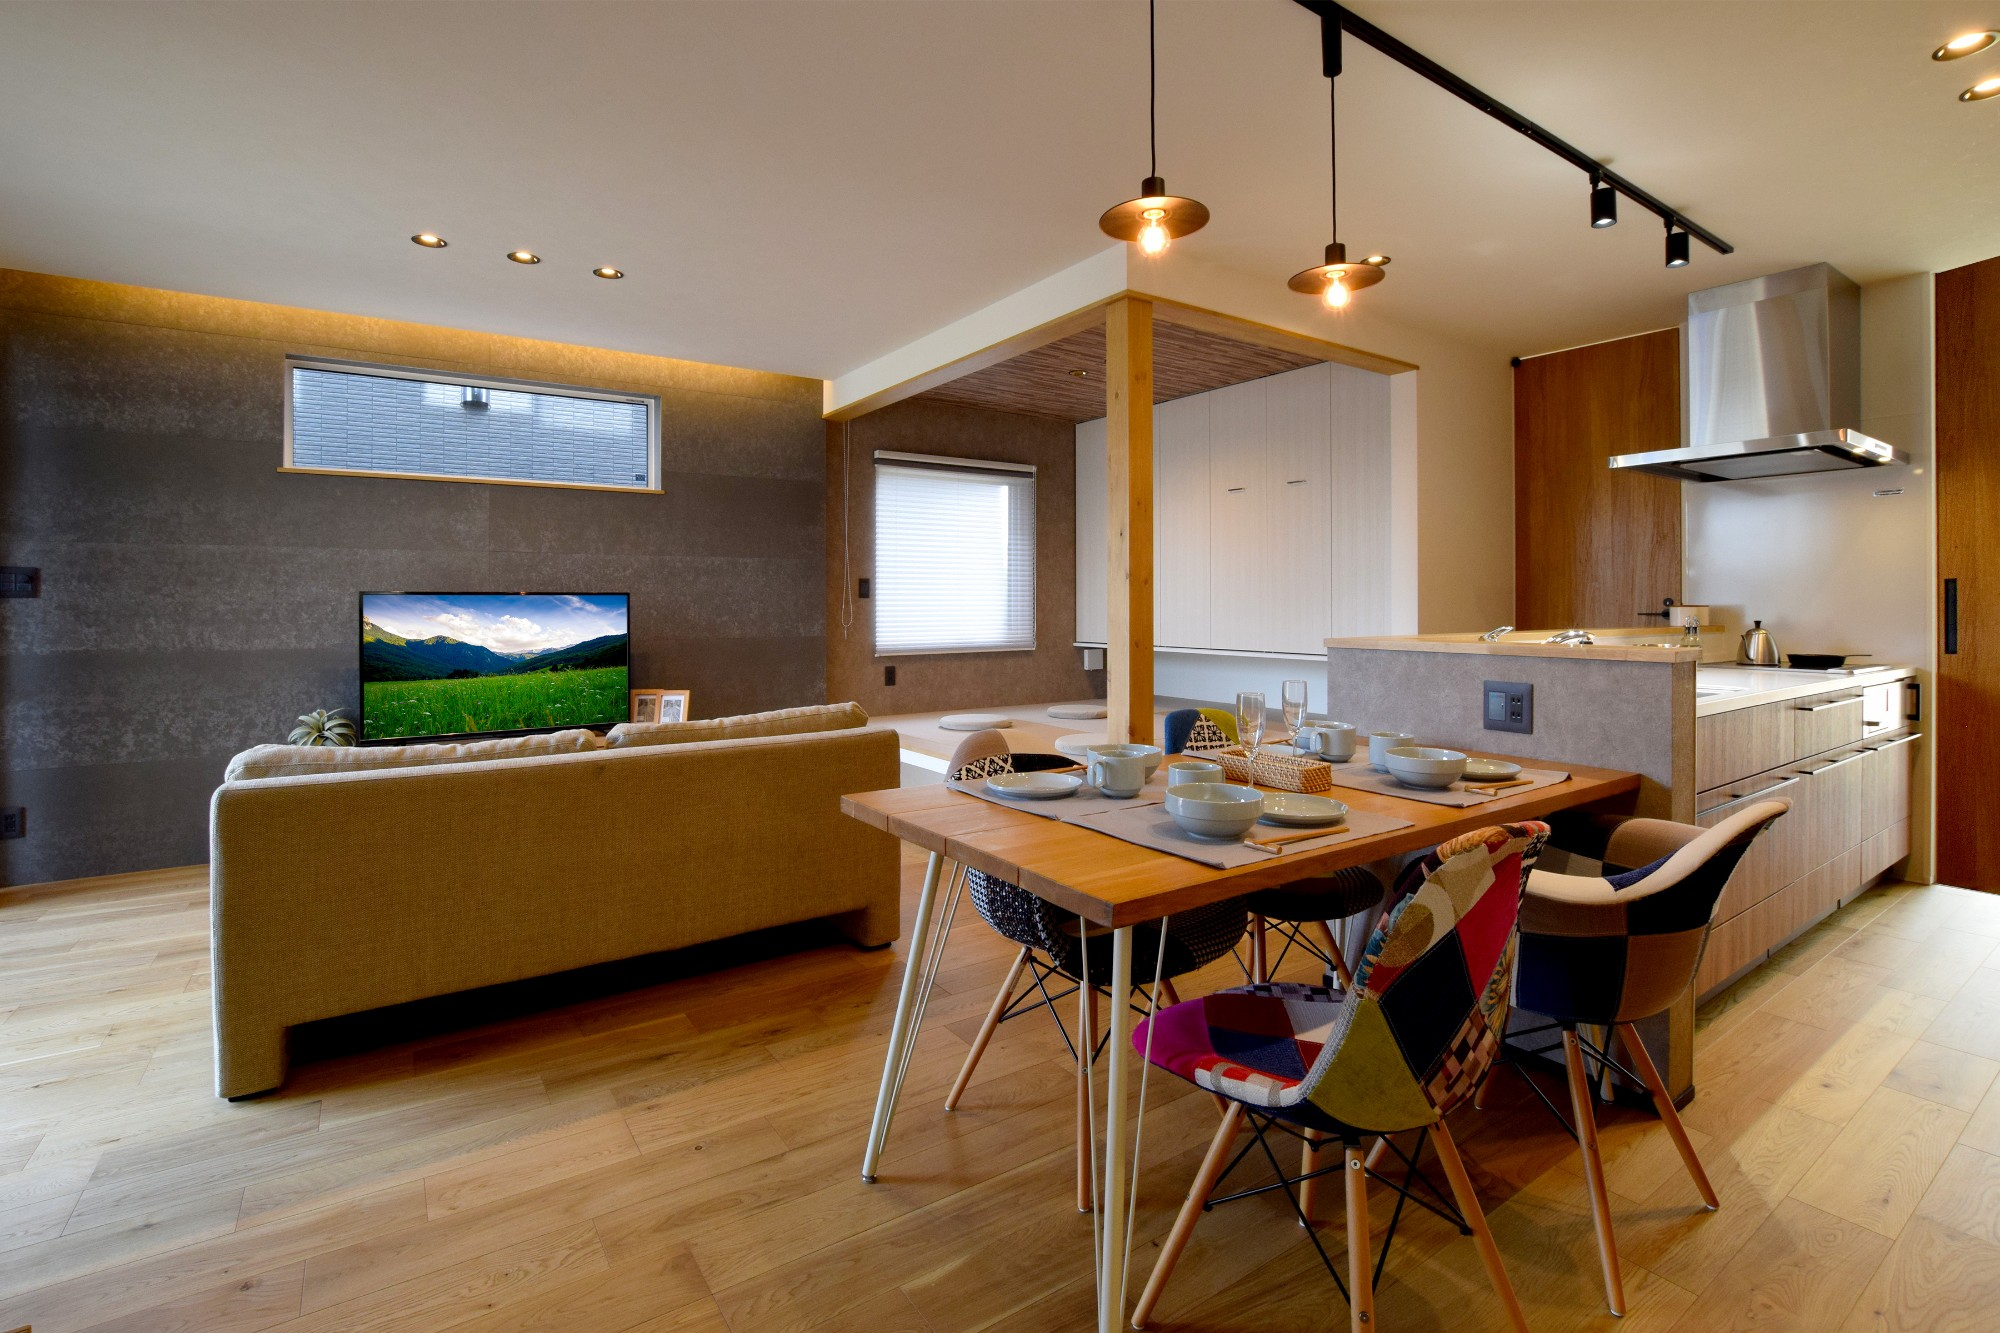 DETAIL HOME(ディテールホーム)「オークを基調としたナチュラルモダンな家」のシンプル・ナチュラルなリビング・ダイニングの実例写真